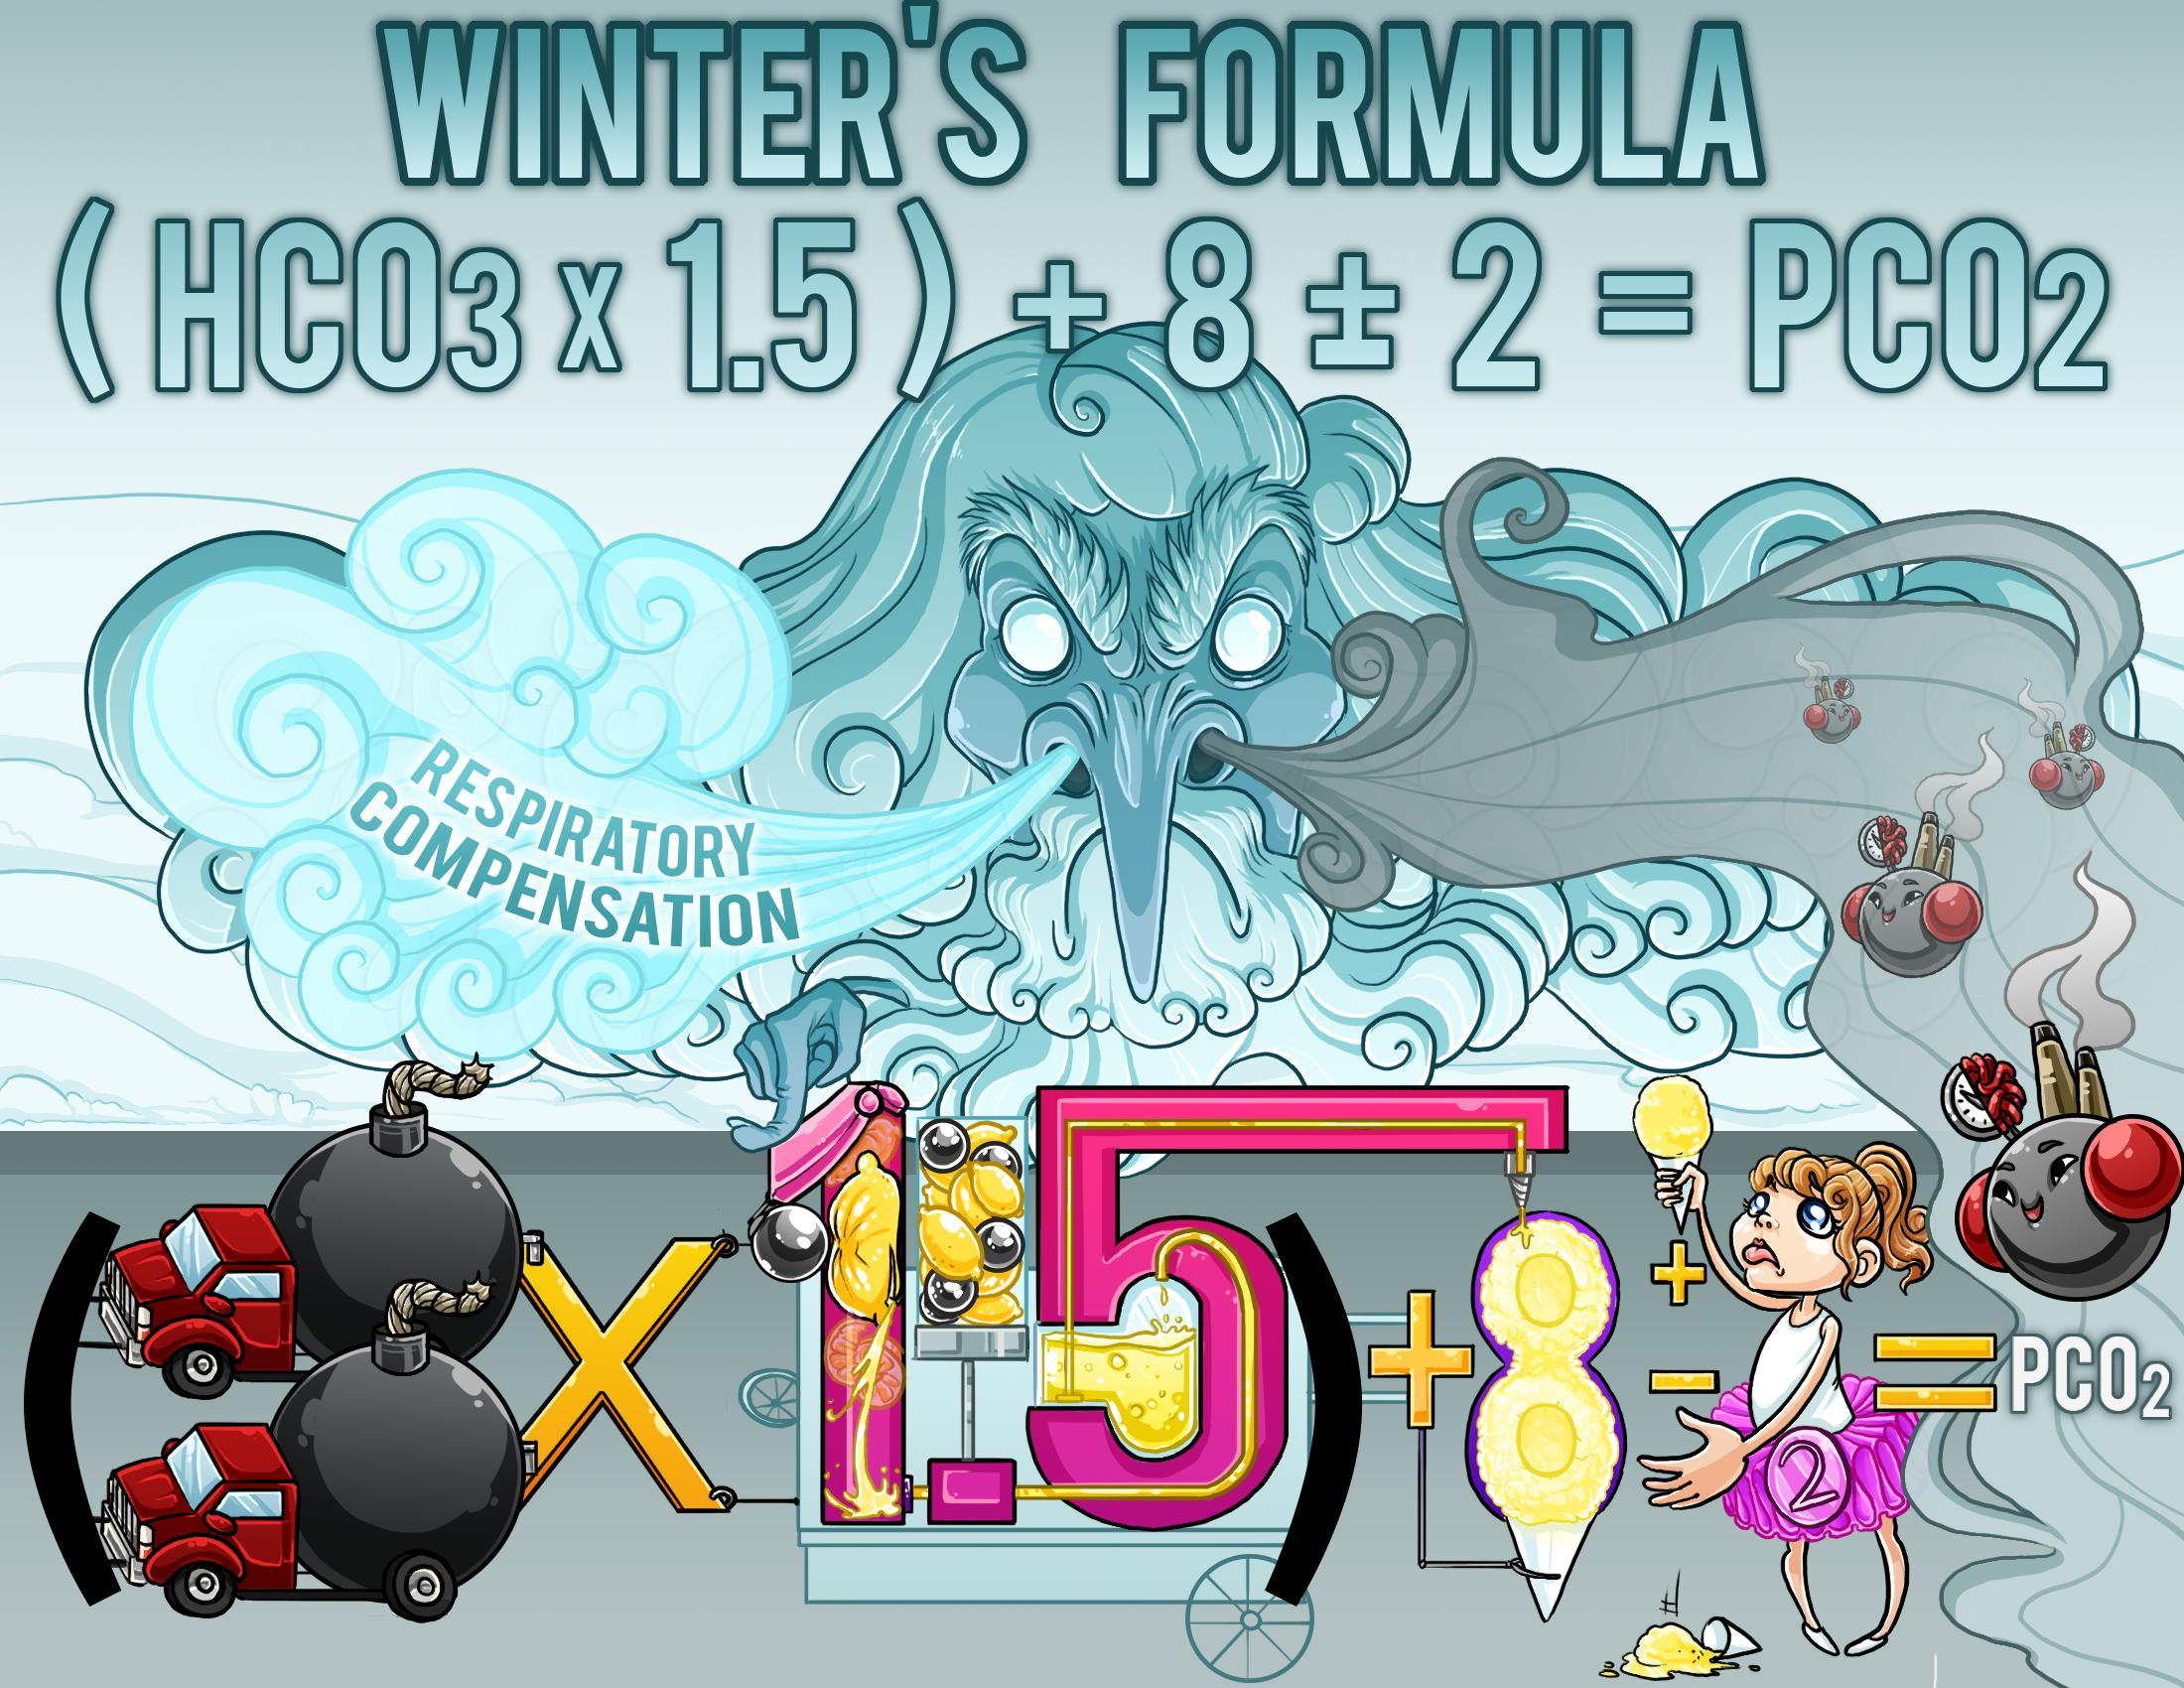 Winter's Formula